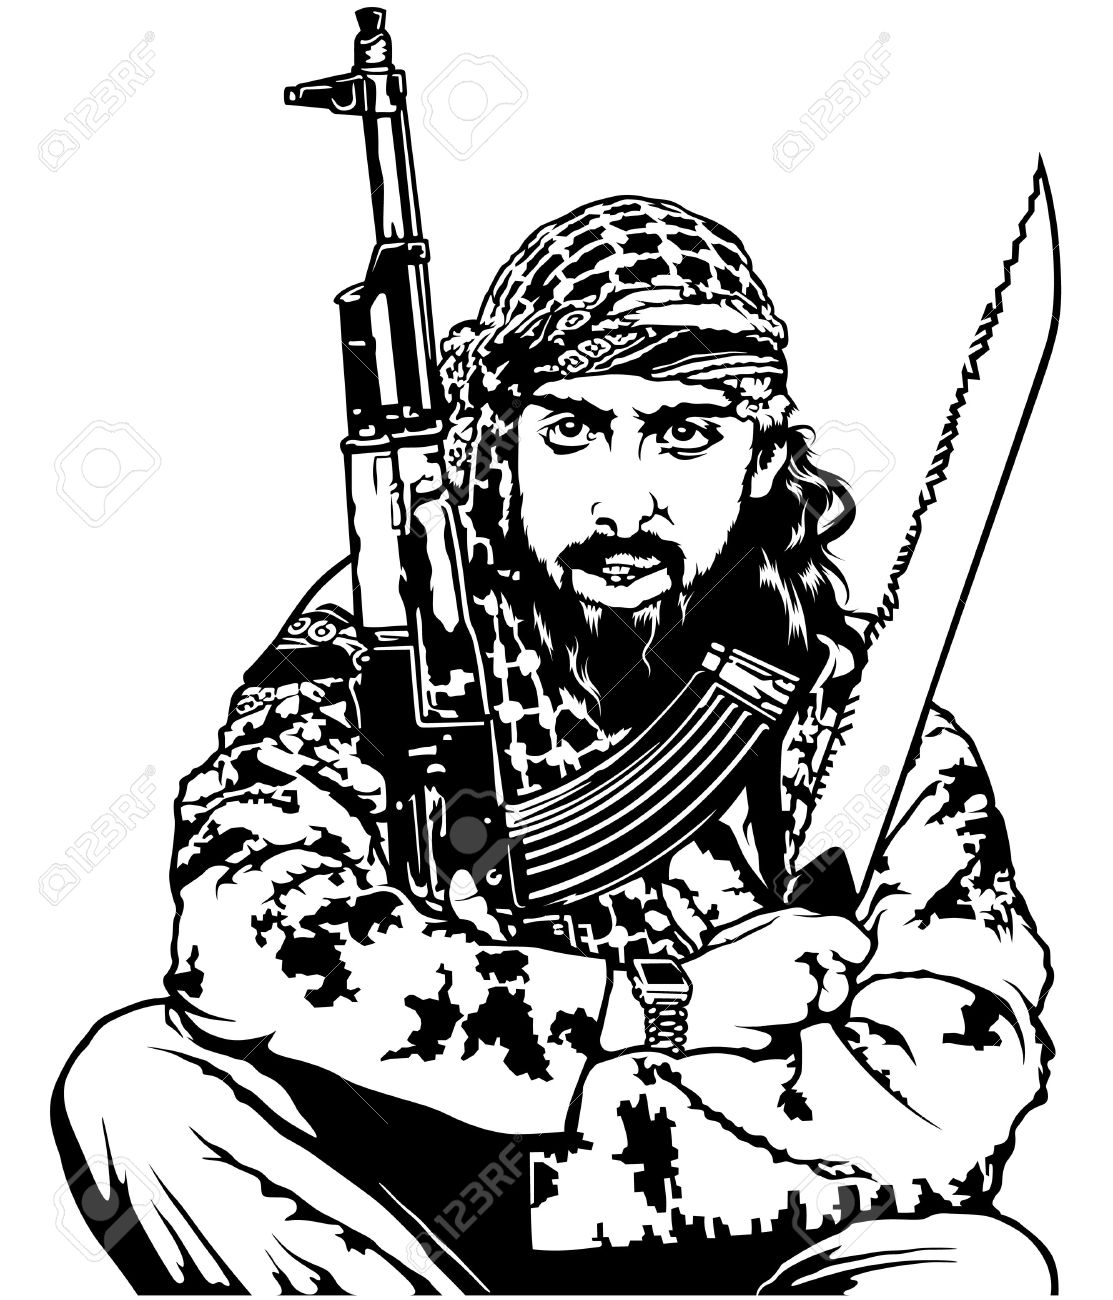 1113x1300 Sitting Terrorist Holding Long Knife And Submachine Gun